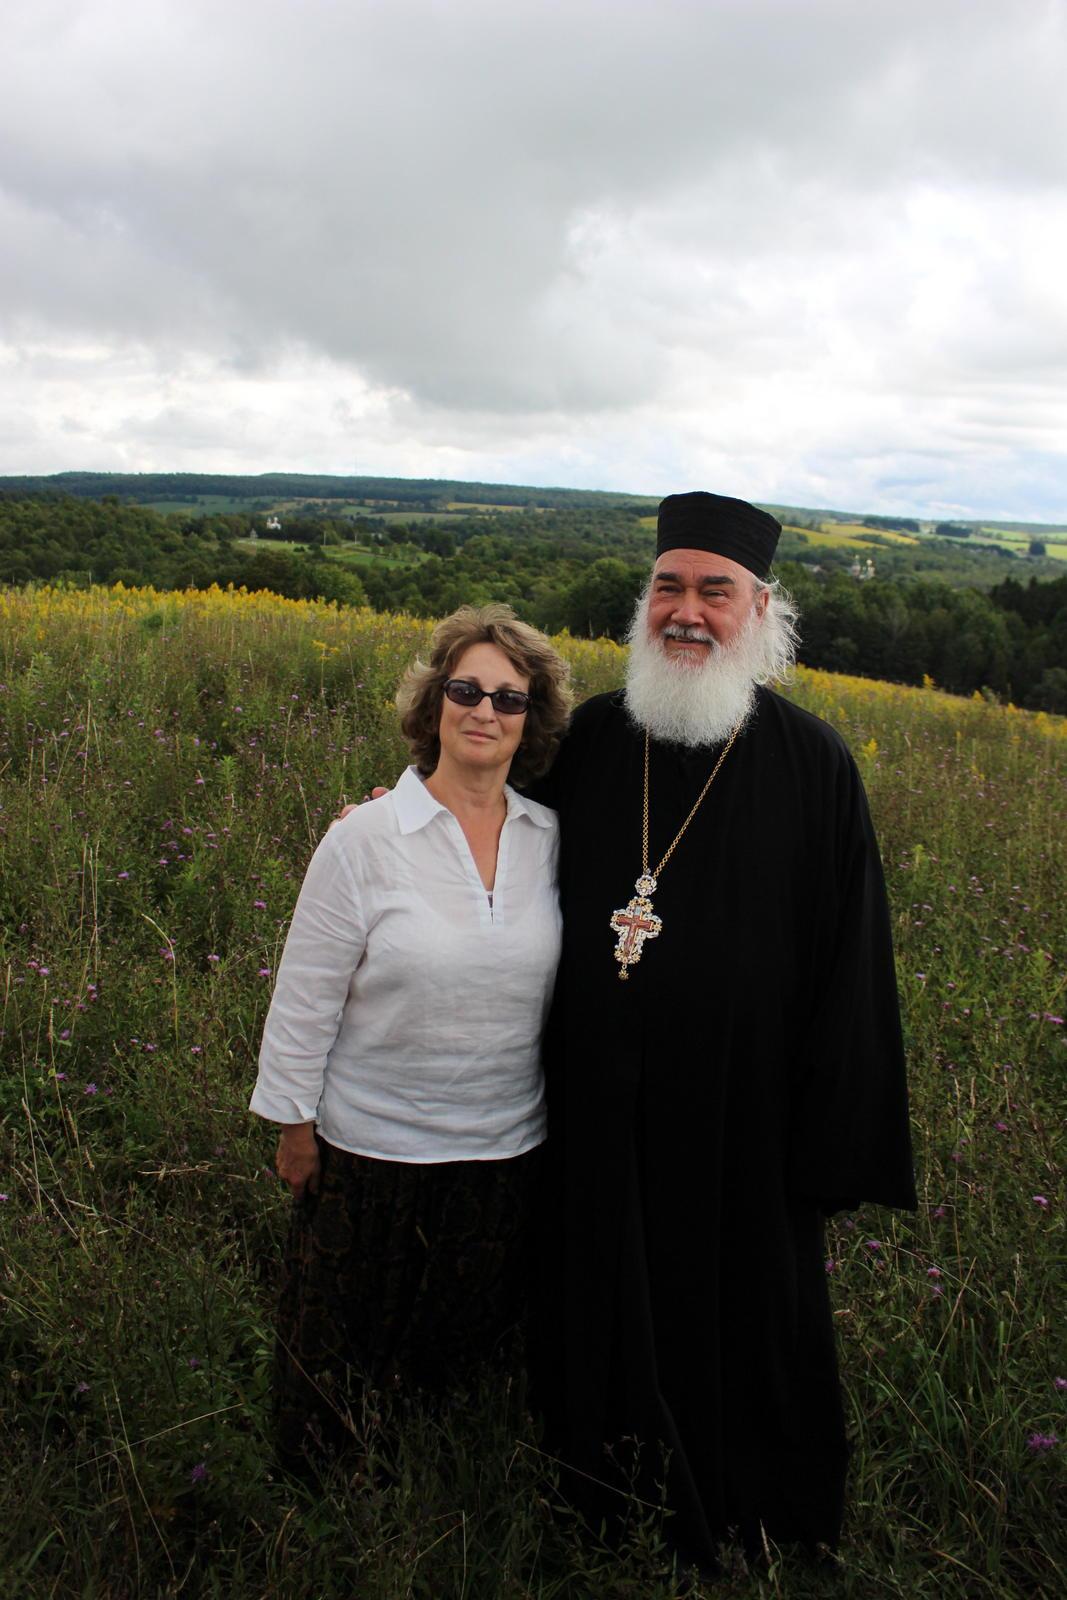 St-Trinity-monastery_02-Sept-2019_3-d-day_105